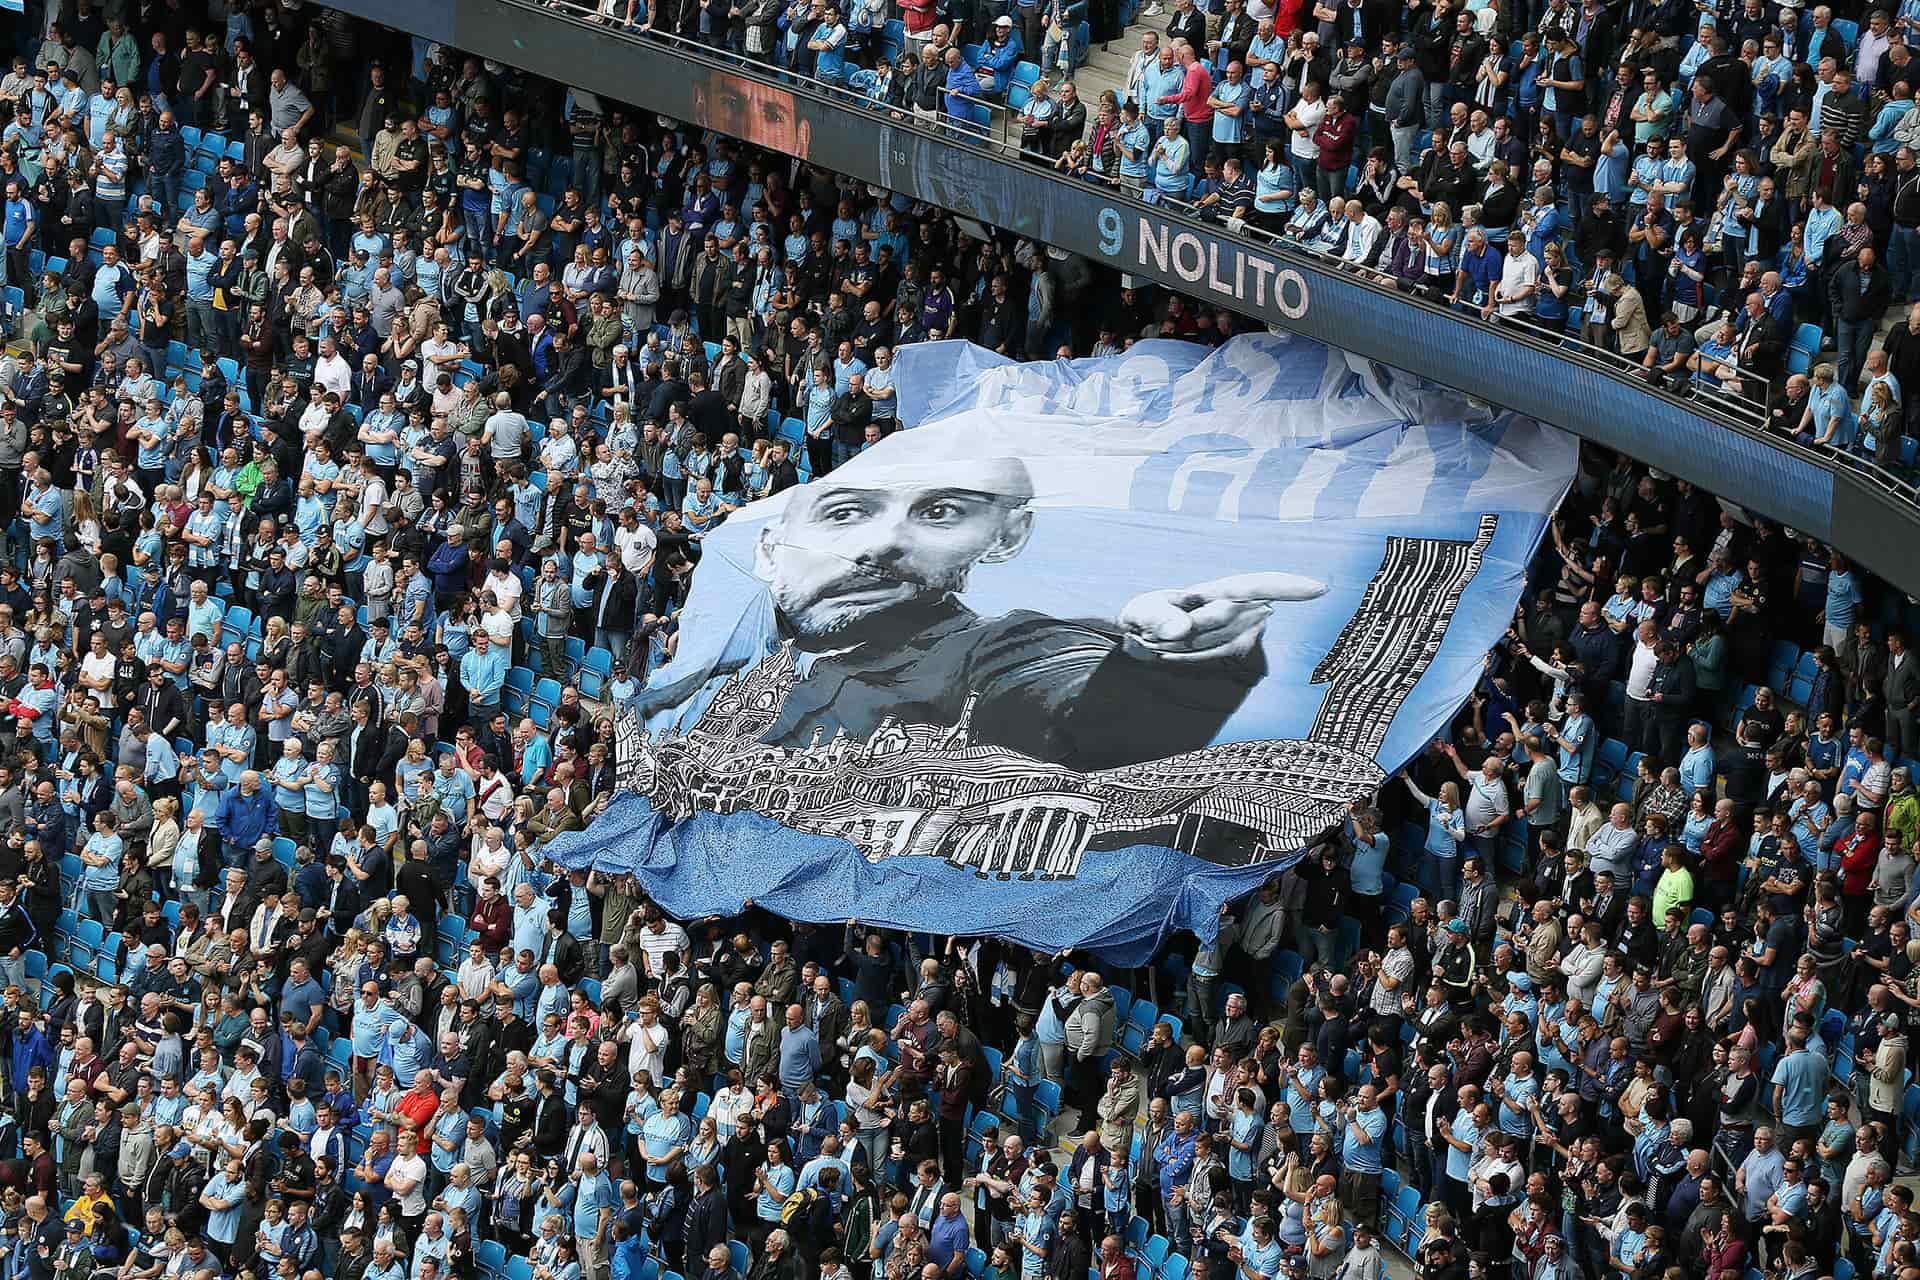 Manchester City - Everton FC, 7 Novemberum 14:00